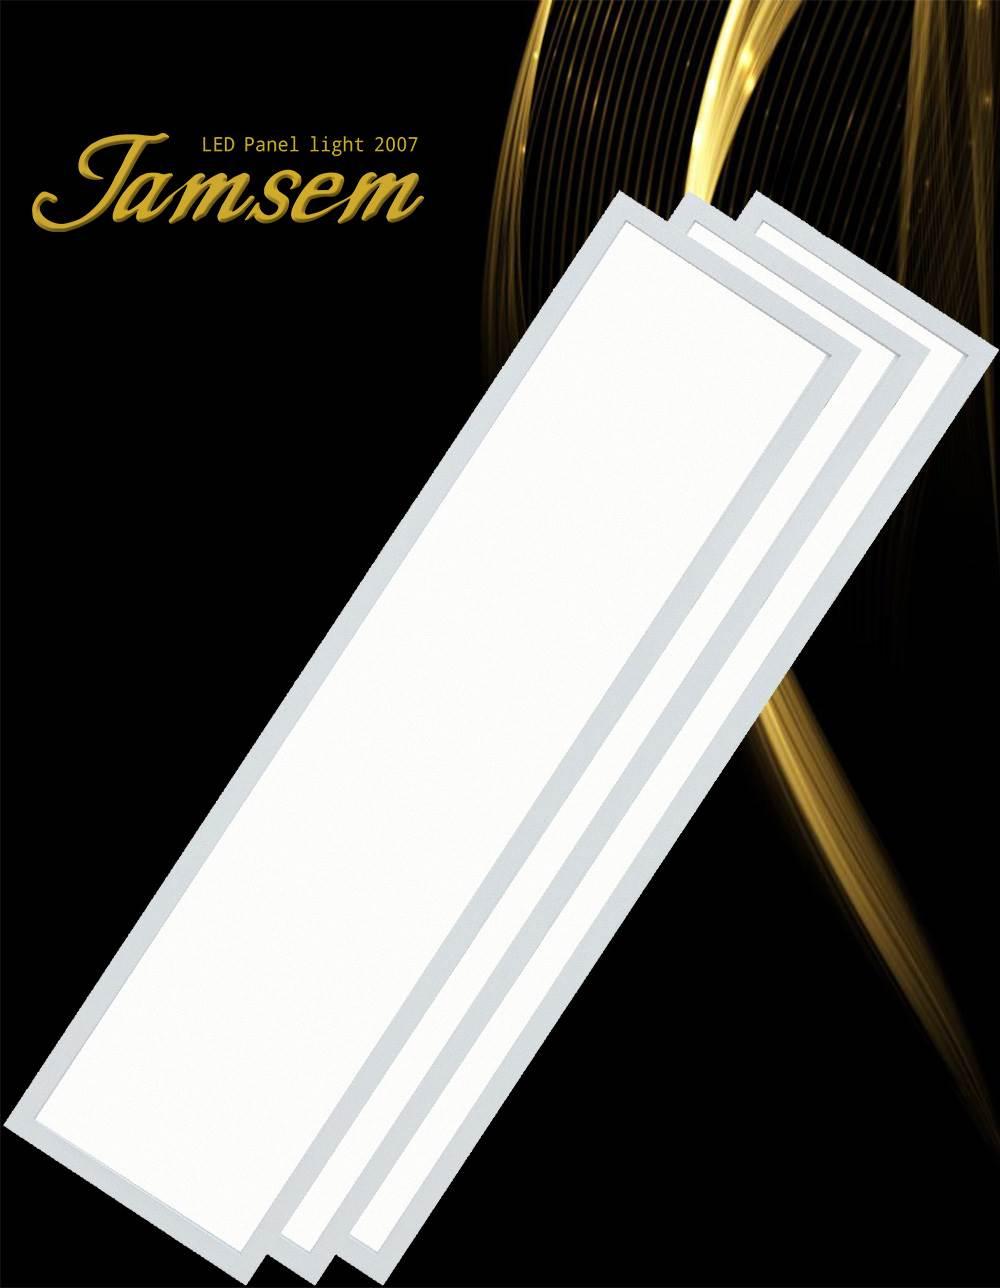 quality design 99e25 e38c7 China LED panel lights manufacturer tells the secret of low ...